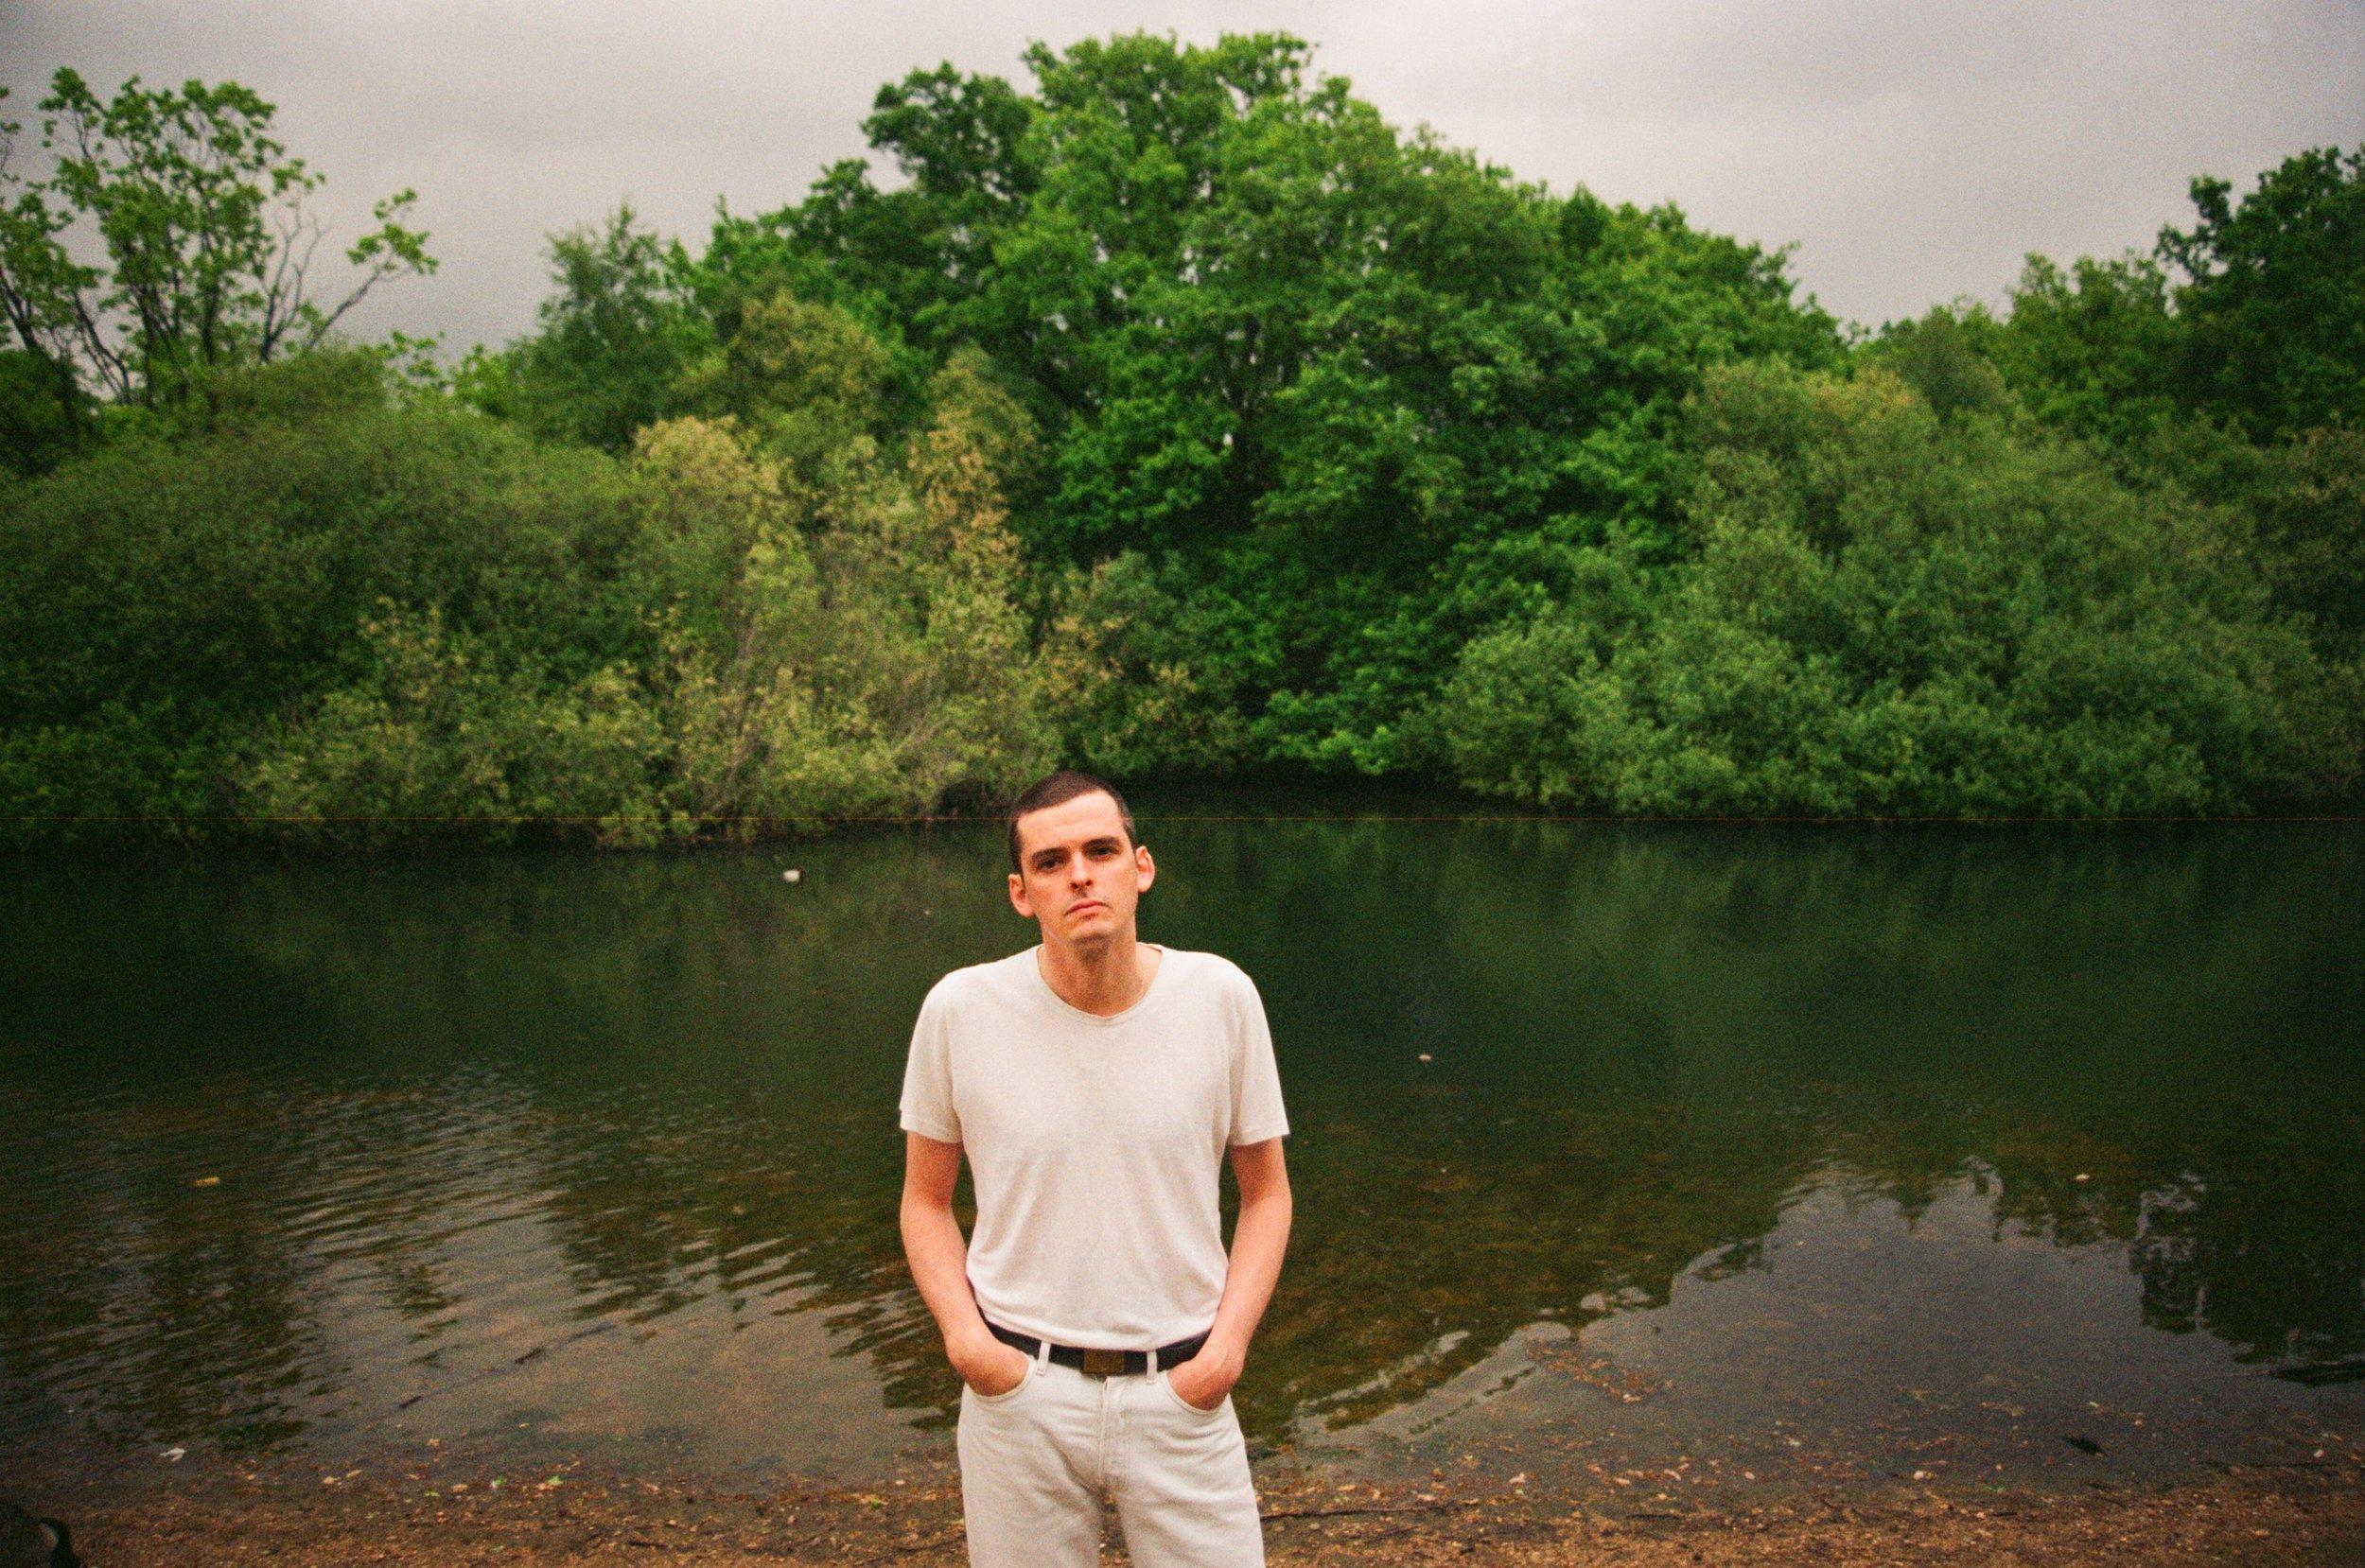 Photo by Tsouni Cooper